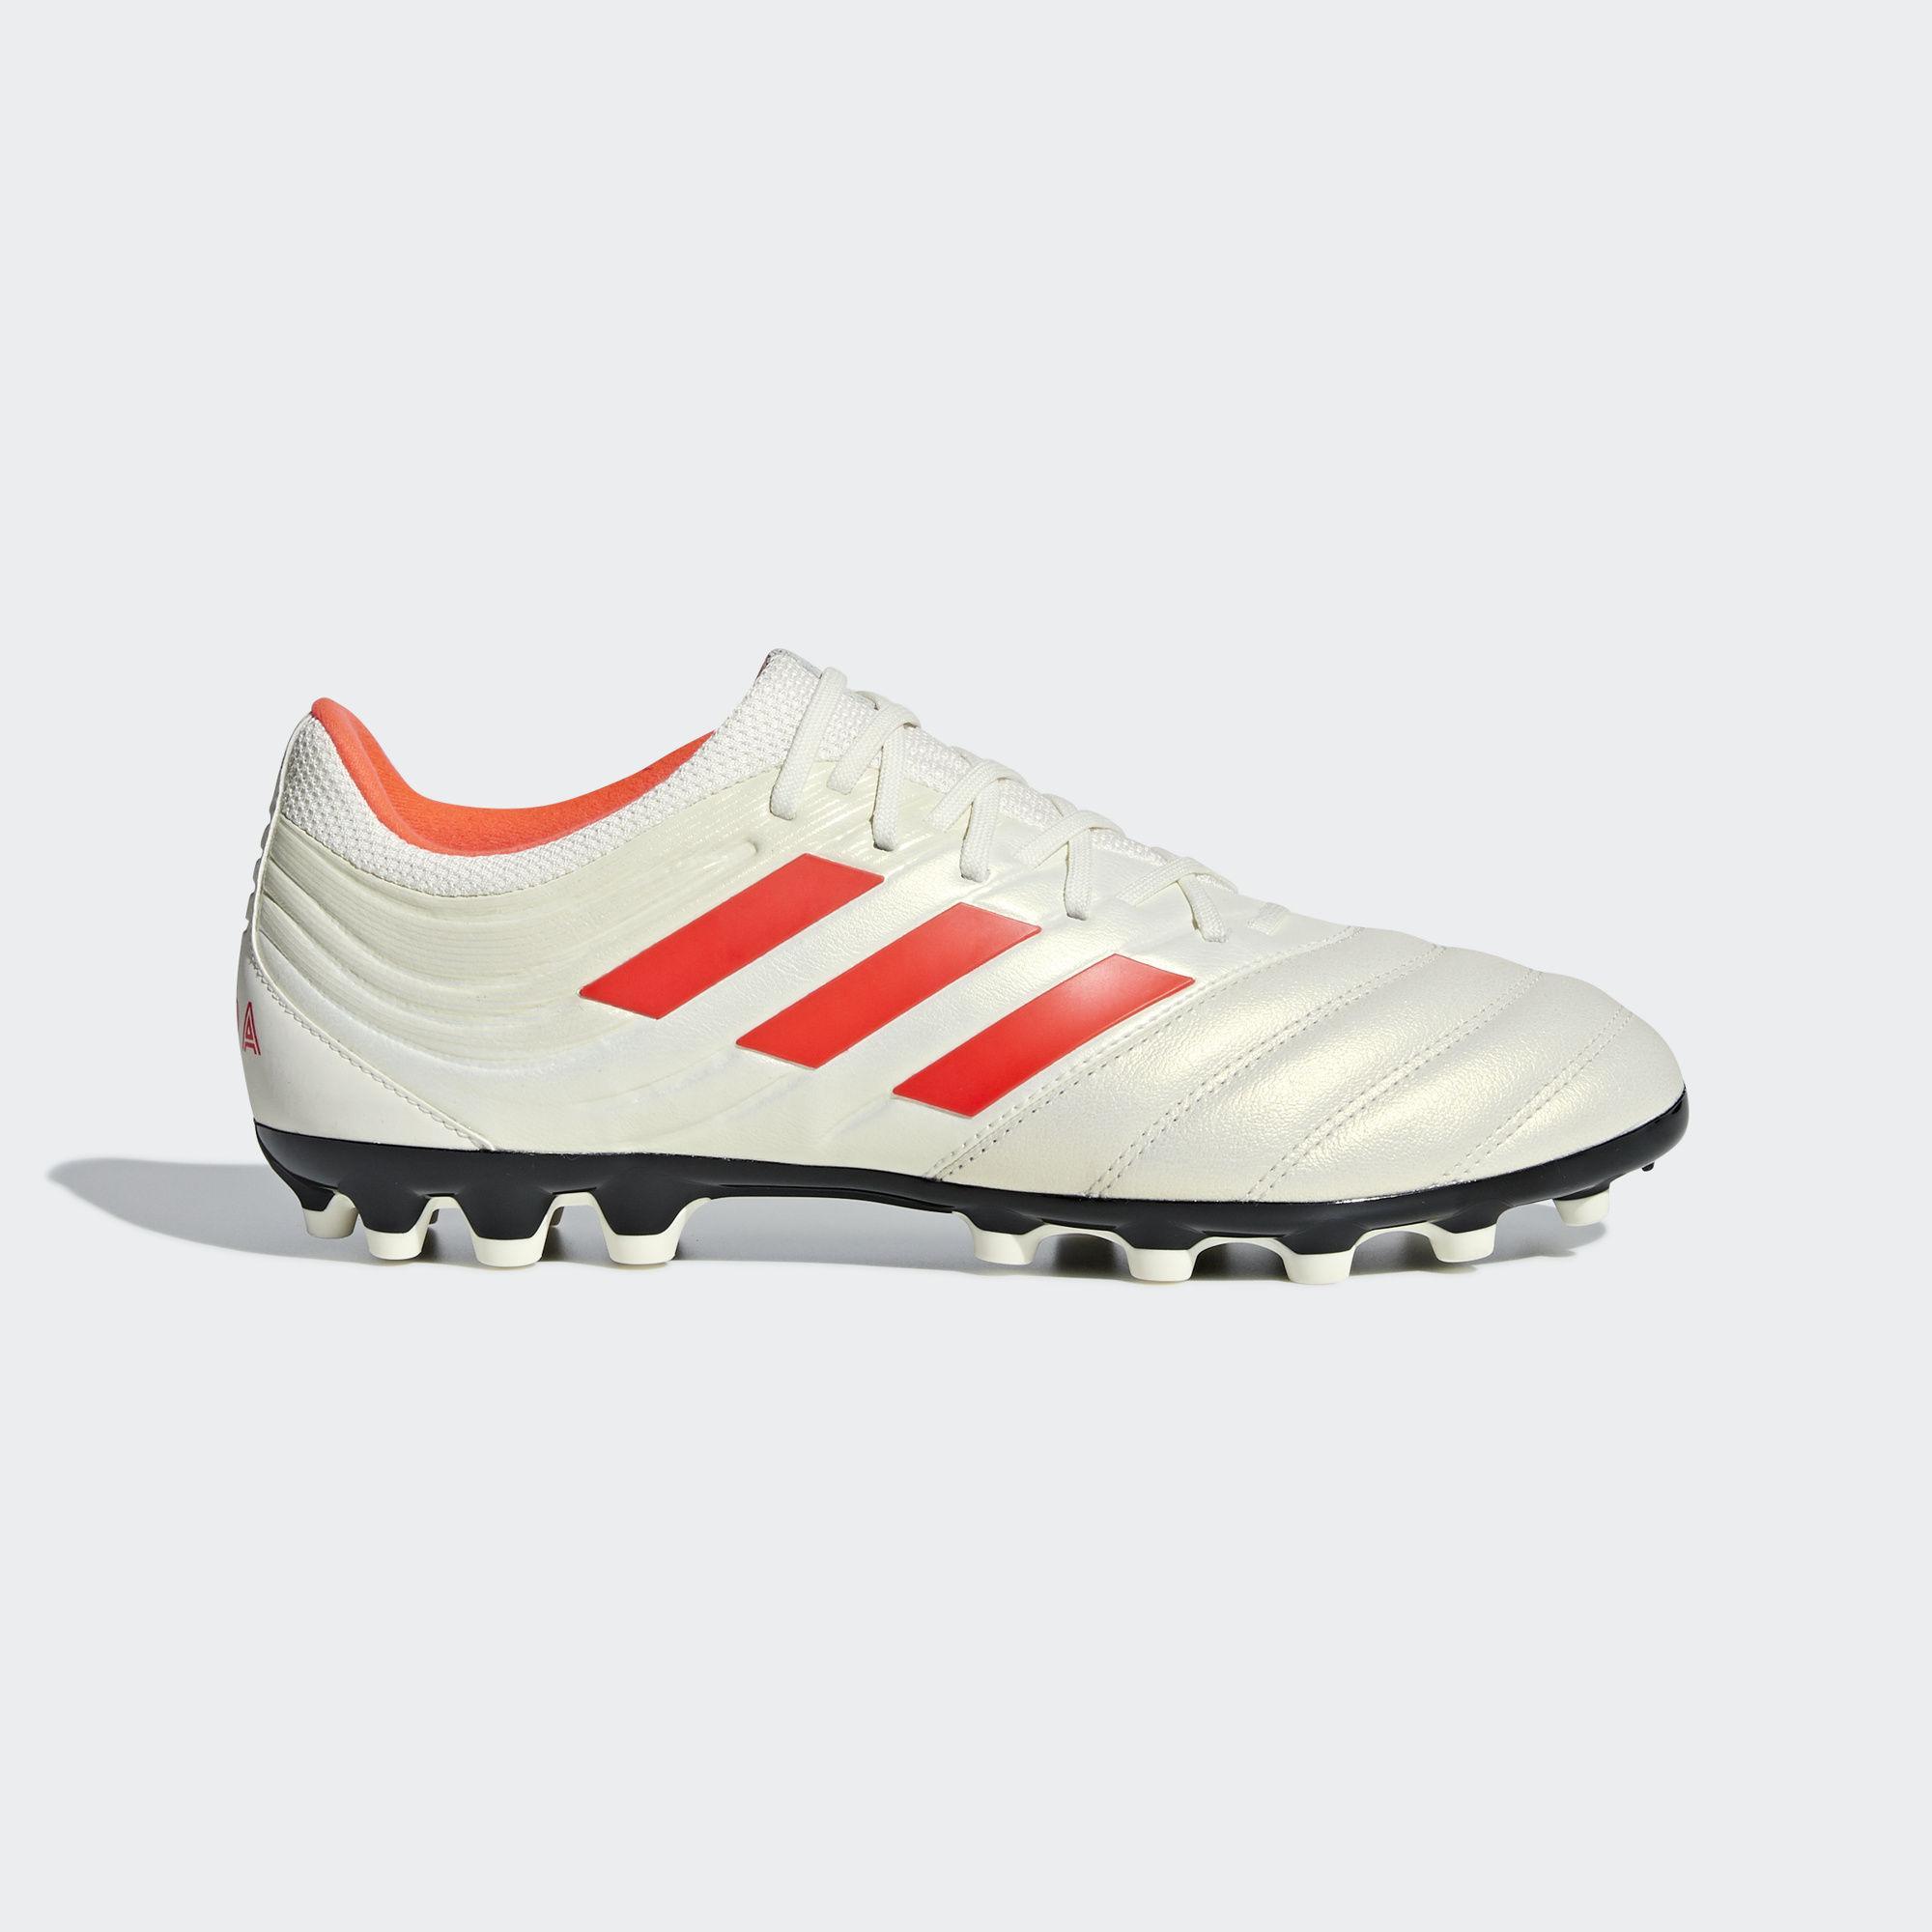 97472606c adidas Copa 19.3 Artificial Grass Boots for Men - Lyst